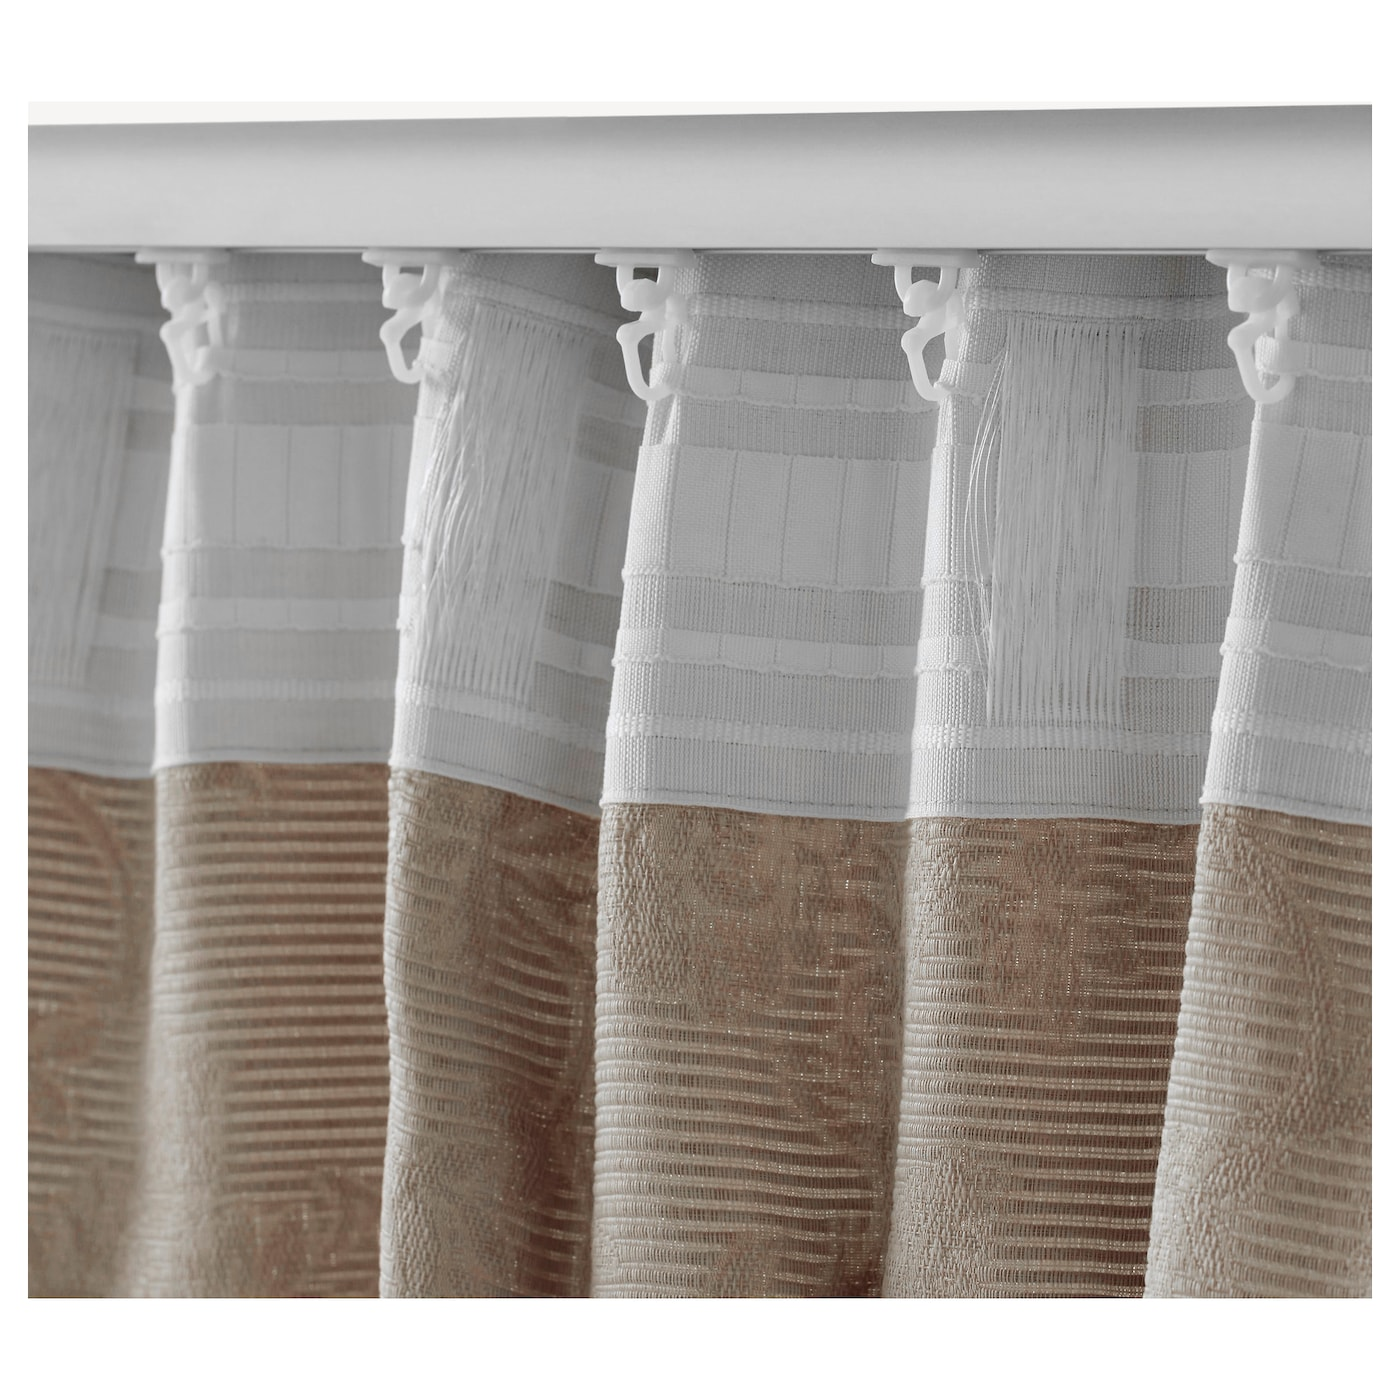 blekviva rideaux embrasses 1 paire beige 145x300 cm ikea. Black Bedroom Furniture Sets. Home Design Ideas